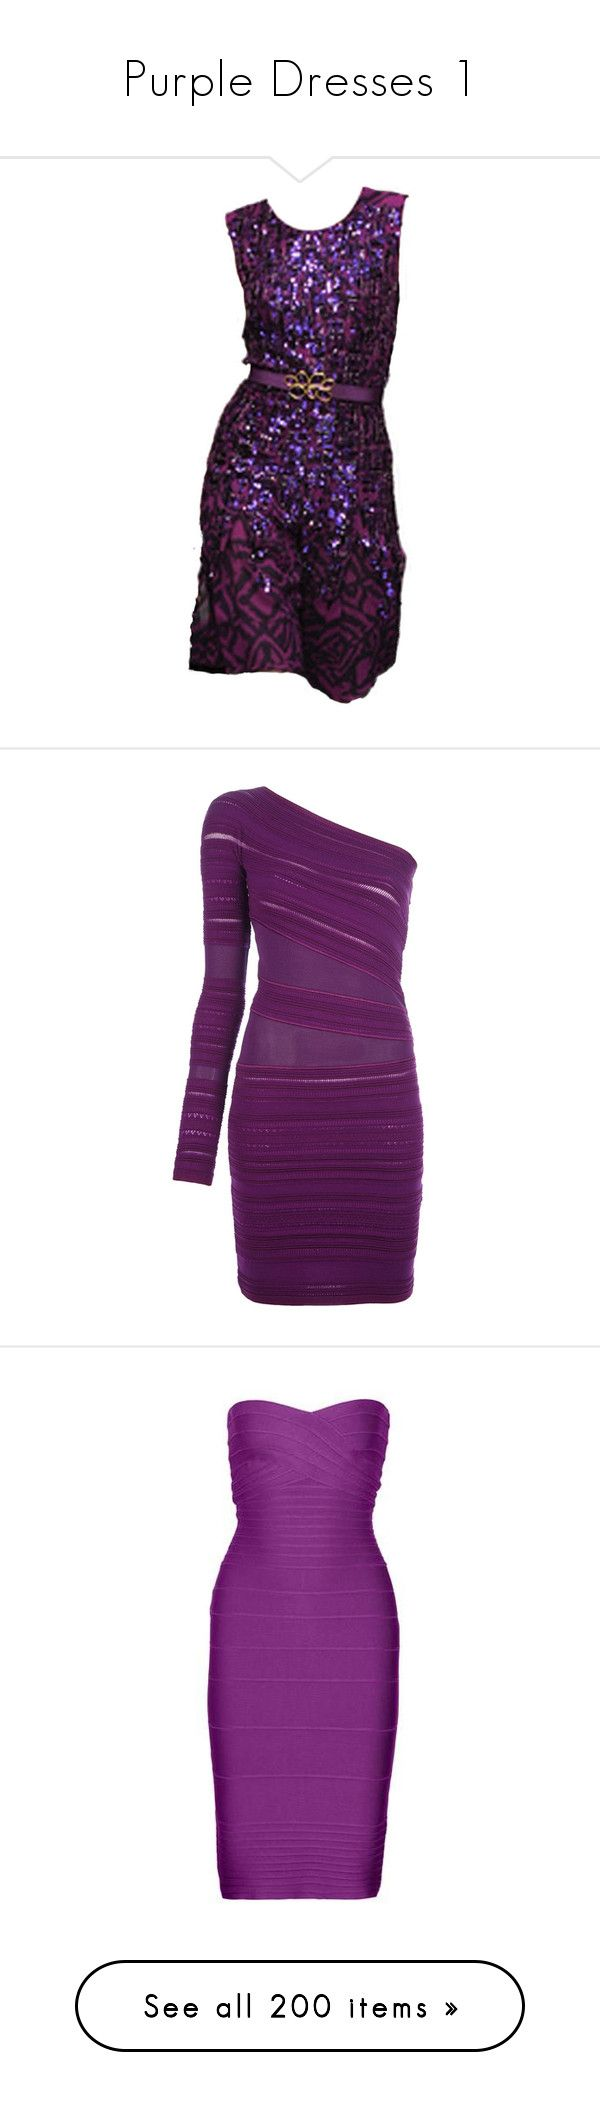 """Purple Dresses 1"" by kingcrimson ❤ liked on Polyvore featuring dresses, purple, purple dress, vestidos, short dresses, robe, long sleeve short dress, long sleeve dress, purple mini dress and long-sleeve mini dress"